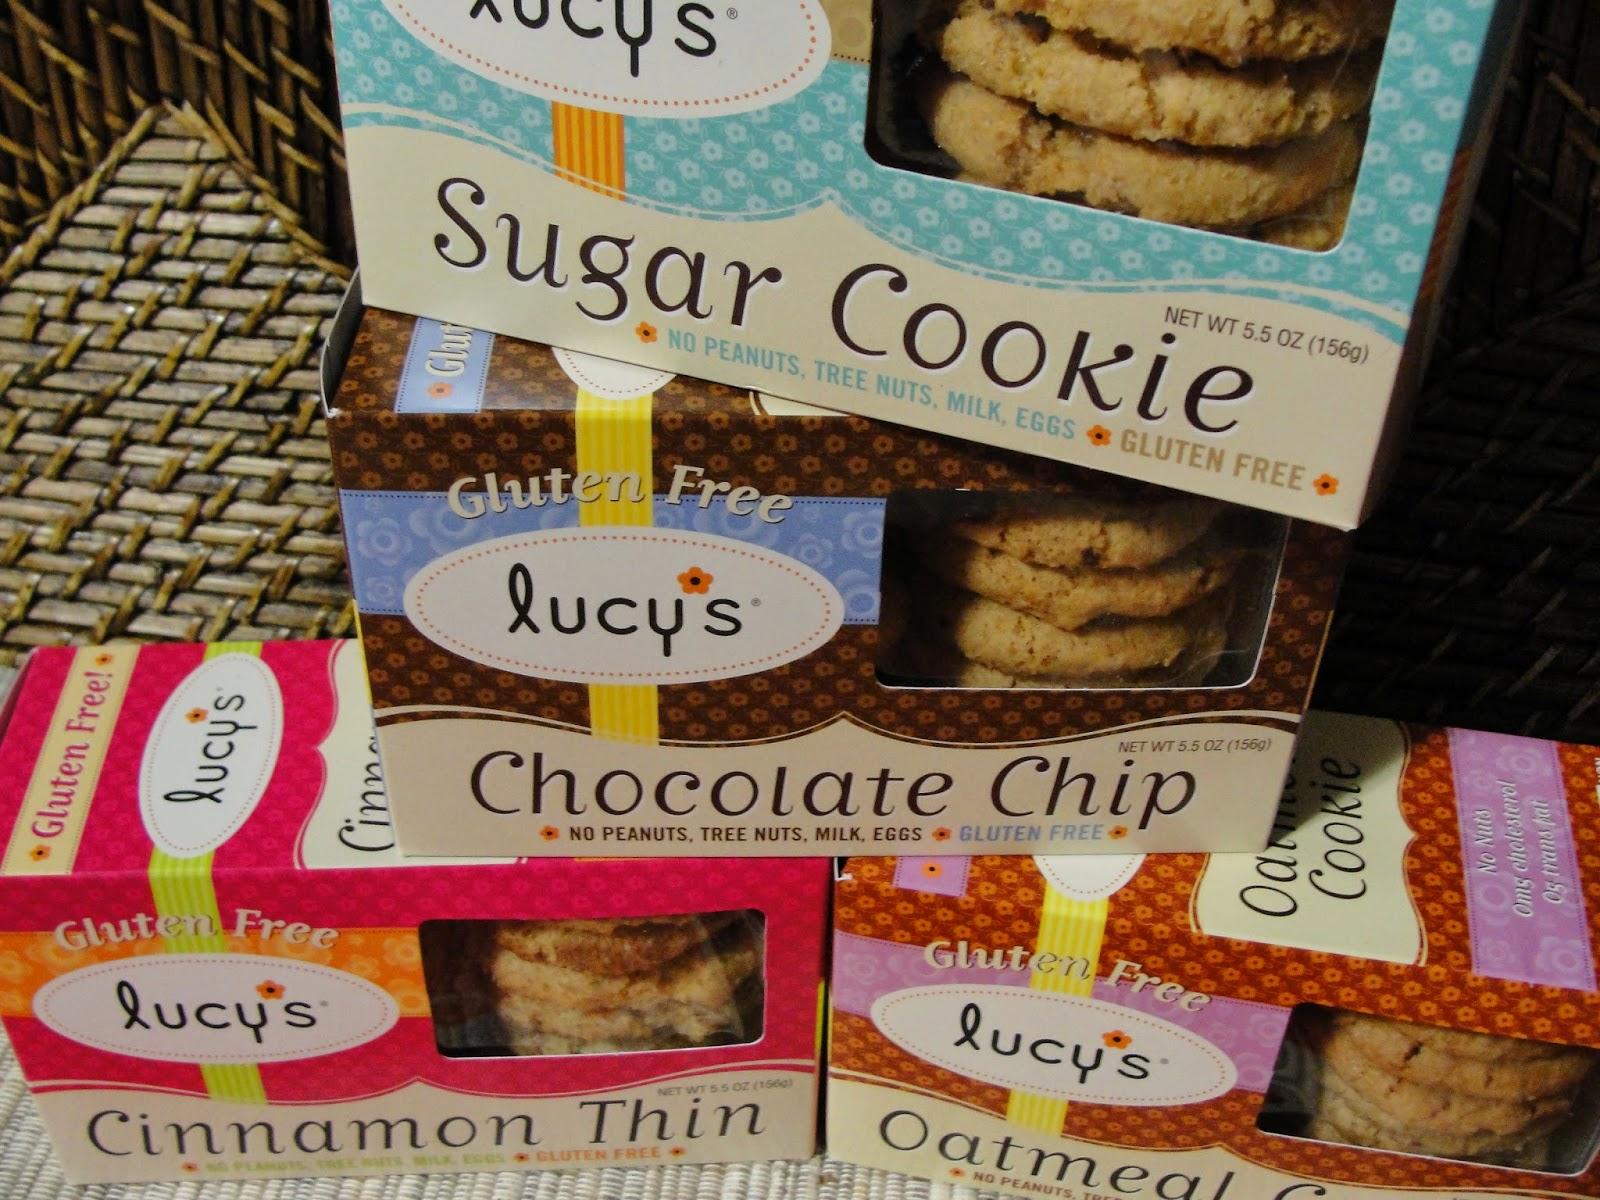 Mengenal Cookies Anti Gluten Rasa Cinnamon Thin